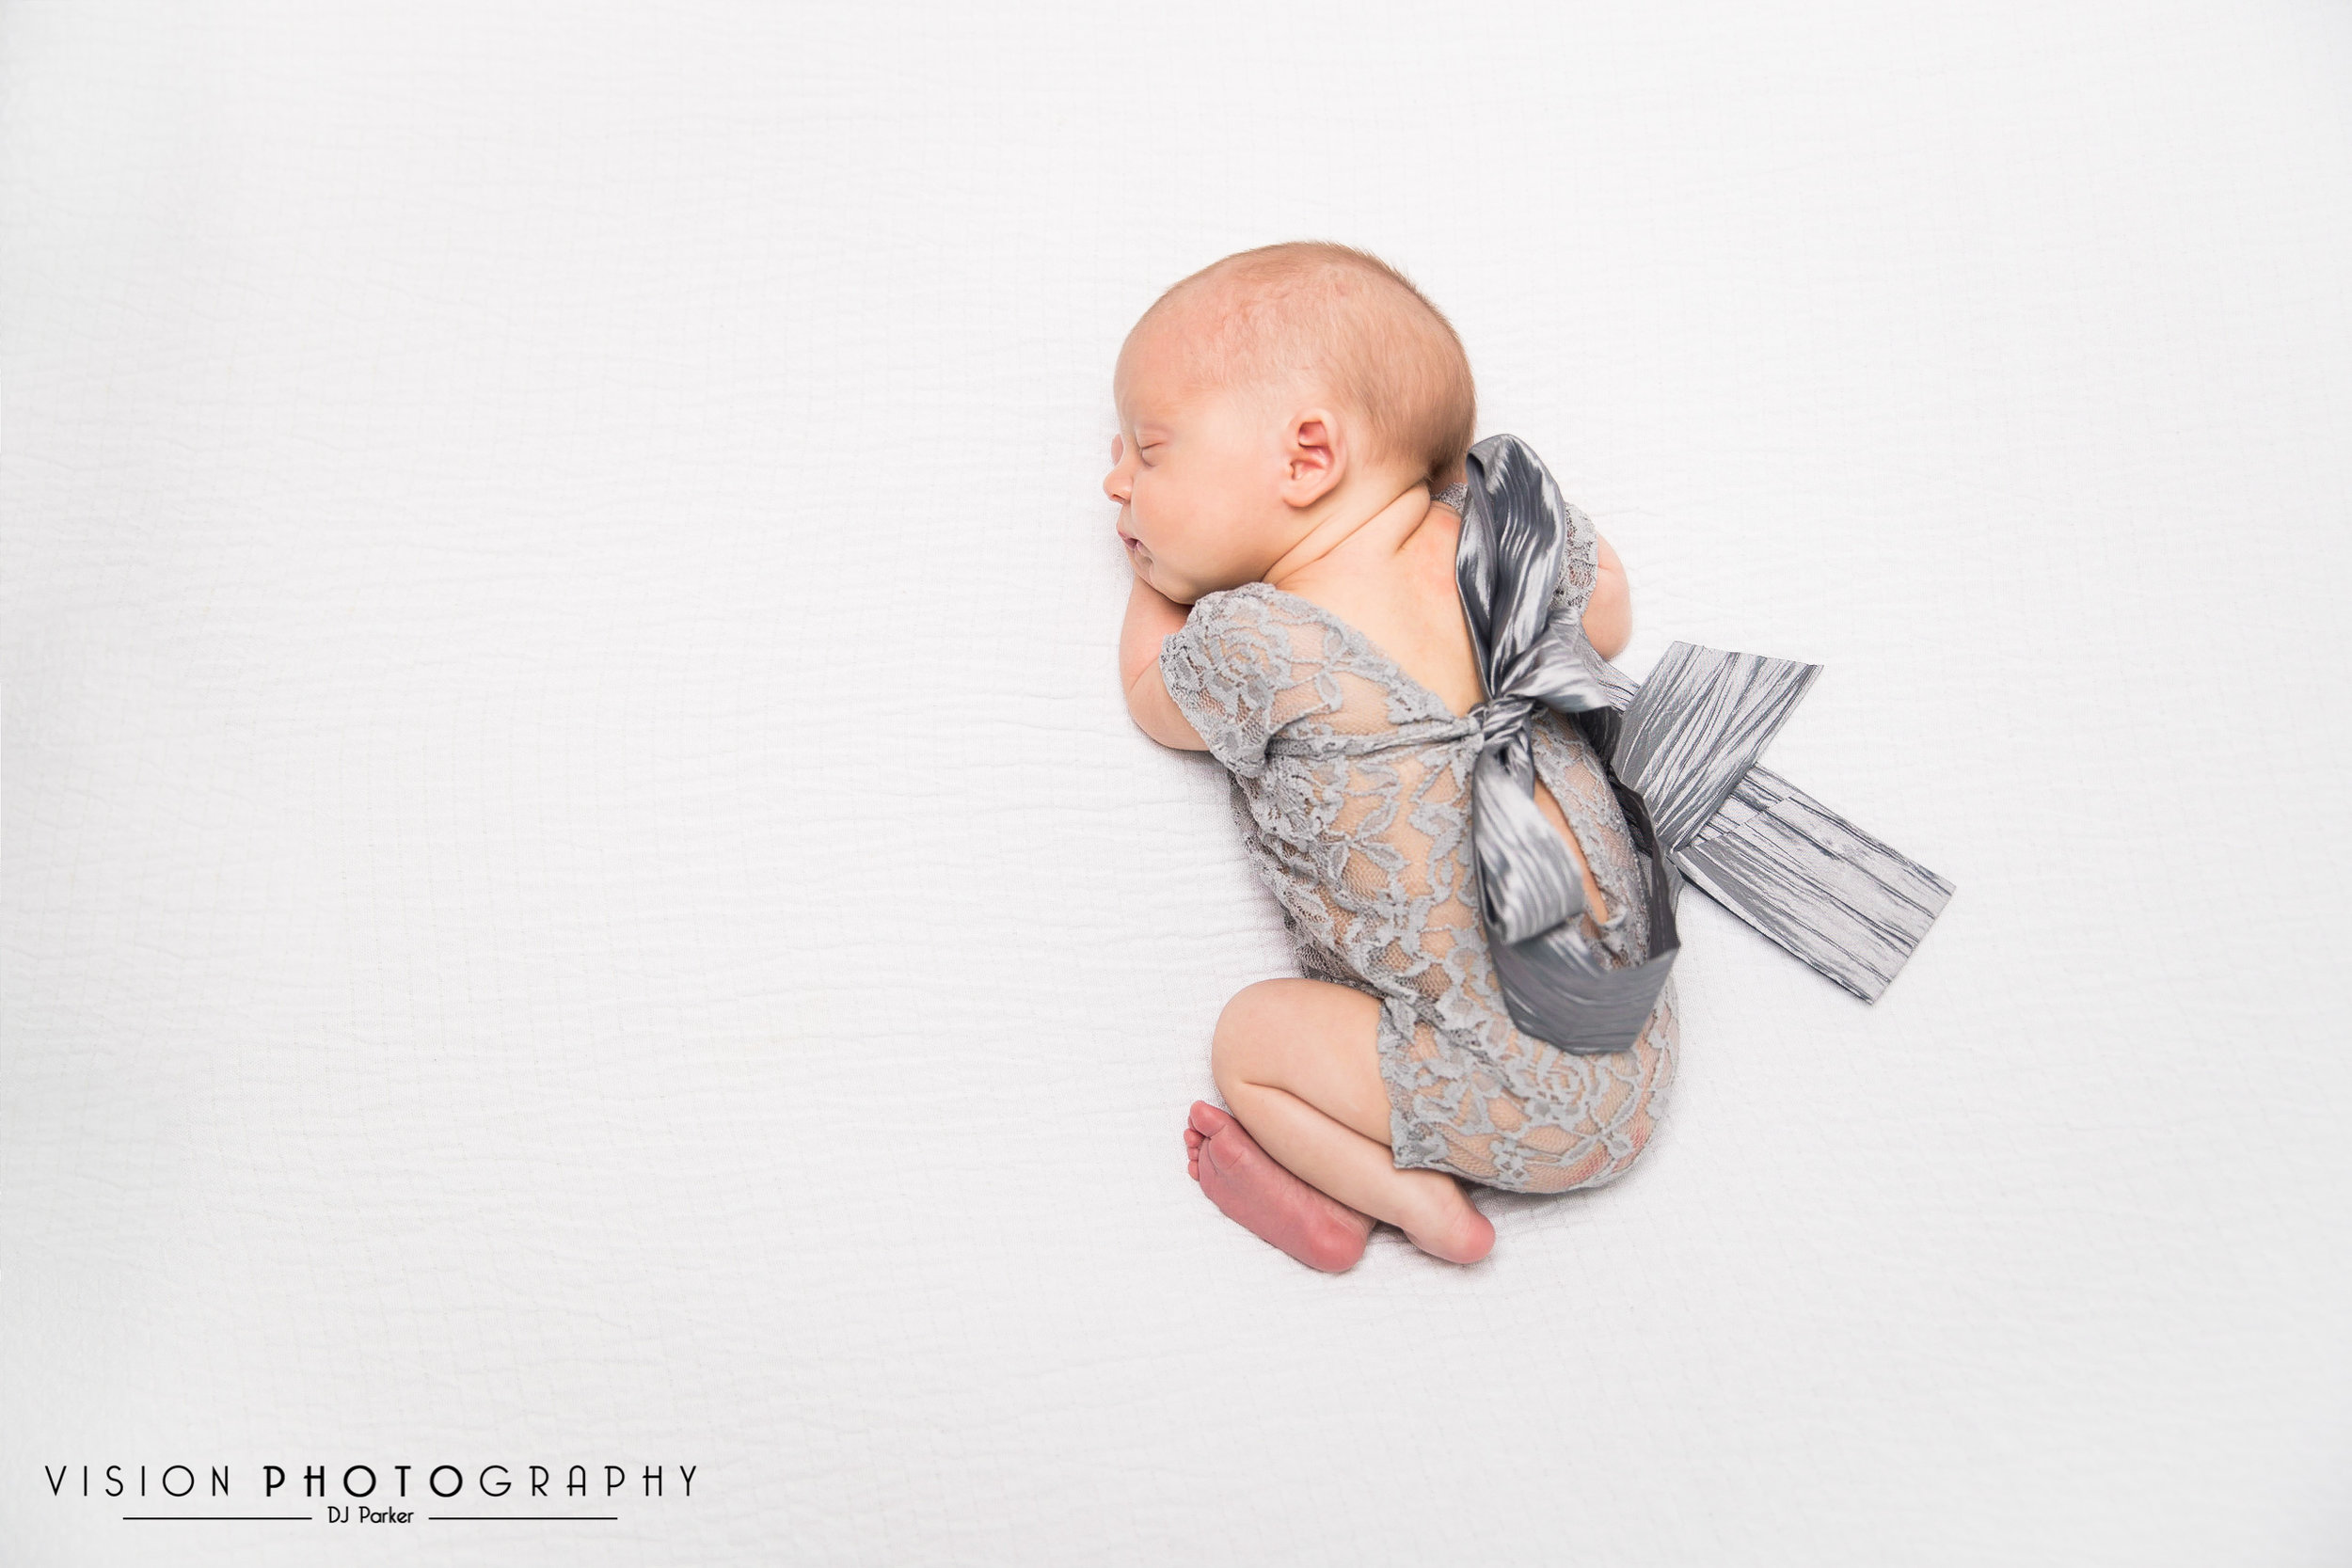 Newborn studio photography bean bag poser